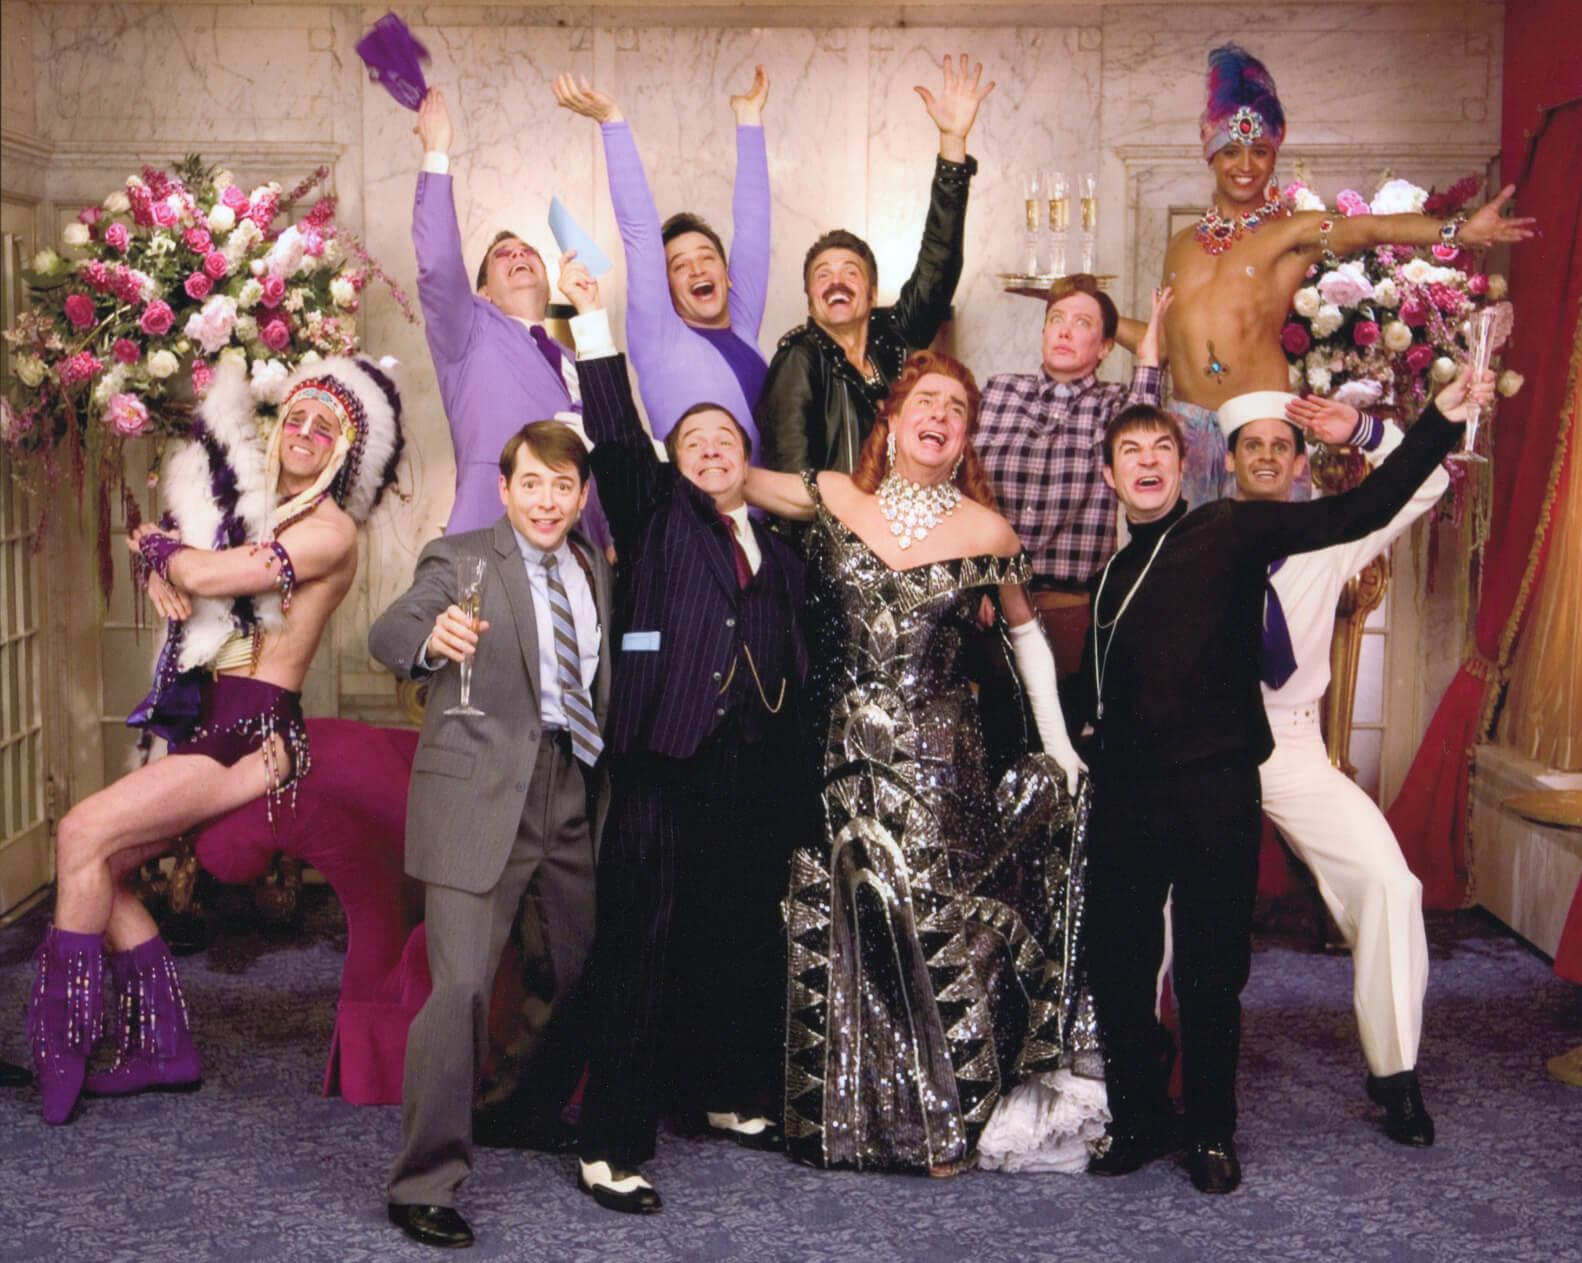 "Leo Bloom (Matthew Broderick), Nathan Lane (Max Bialystock), Roger Debris (Gary Beach) and Carmen Ghia (Roger Bart) celebrating with friends singing ""Keep it Gay""."